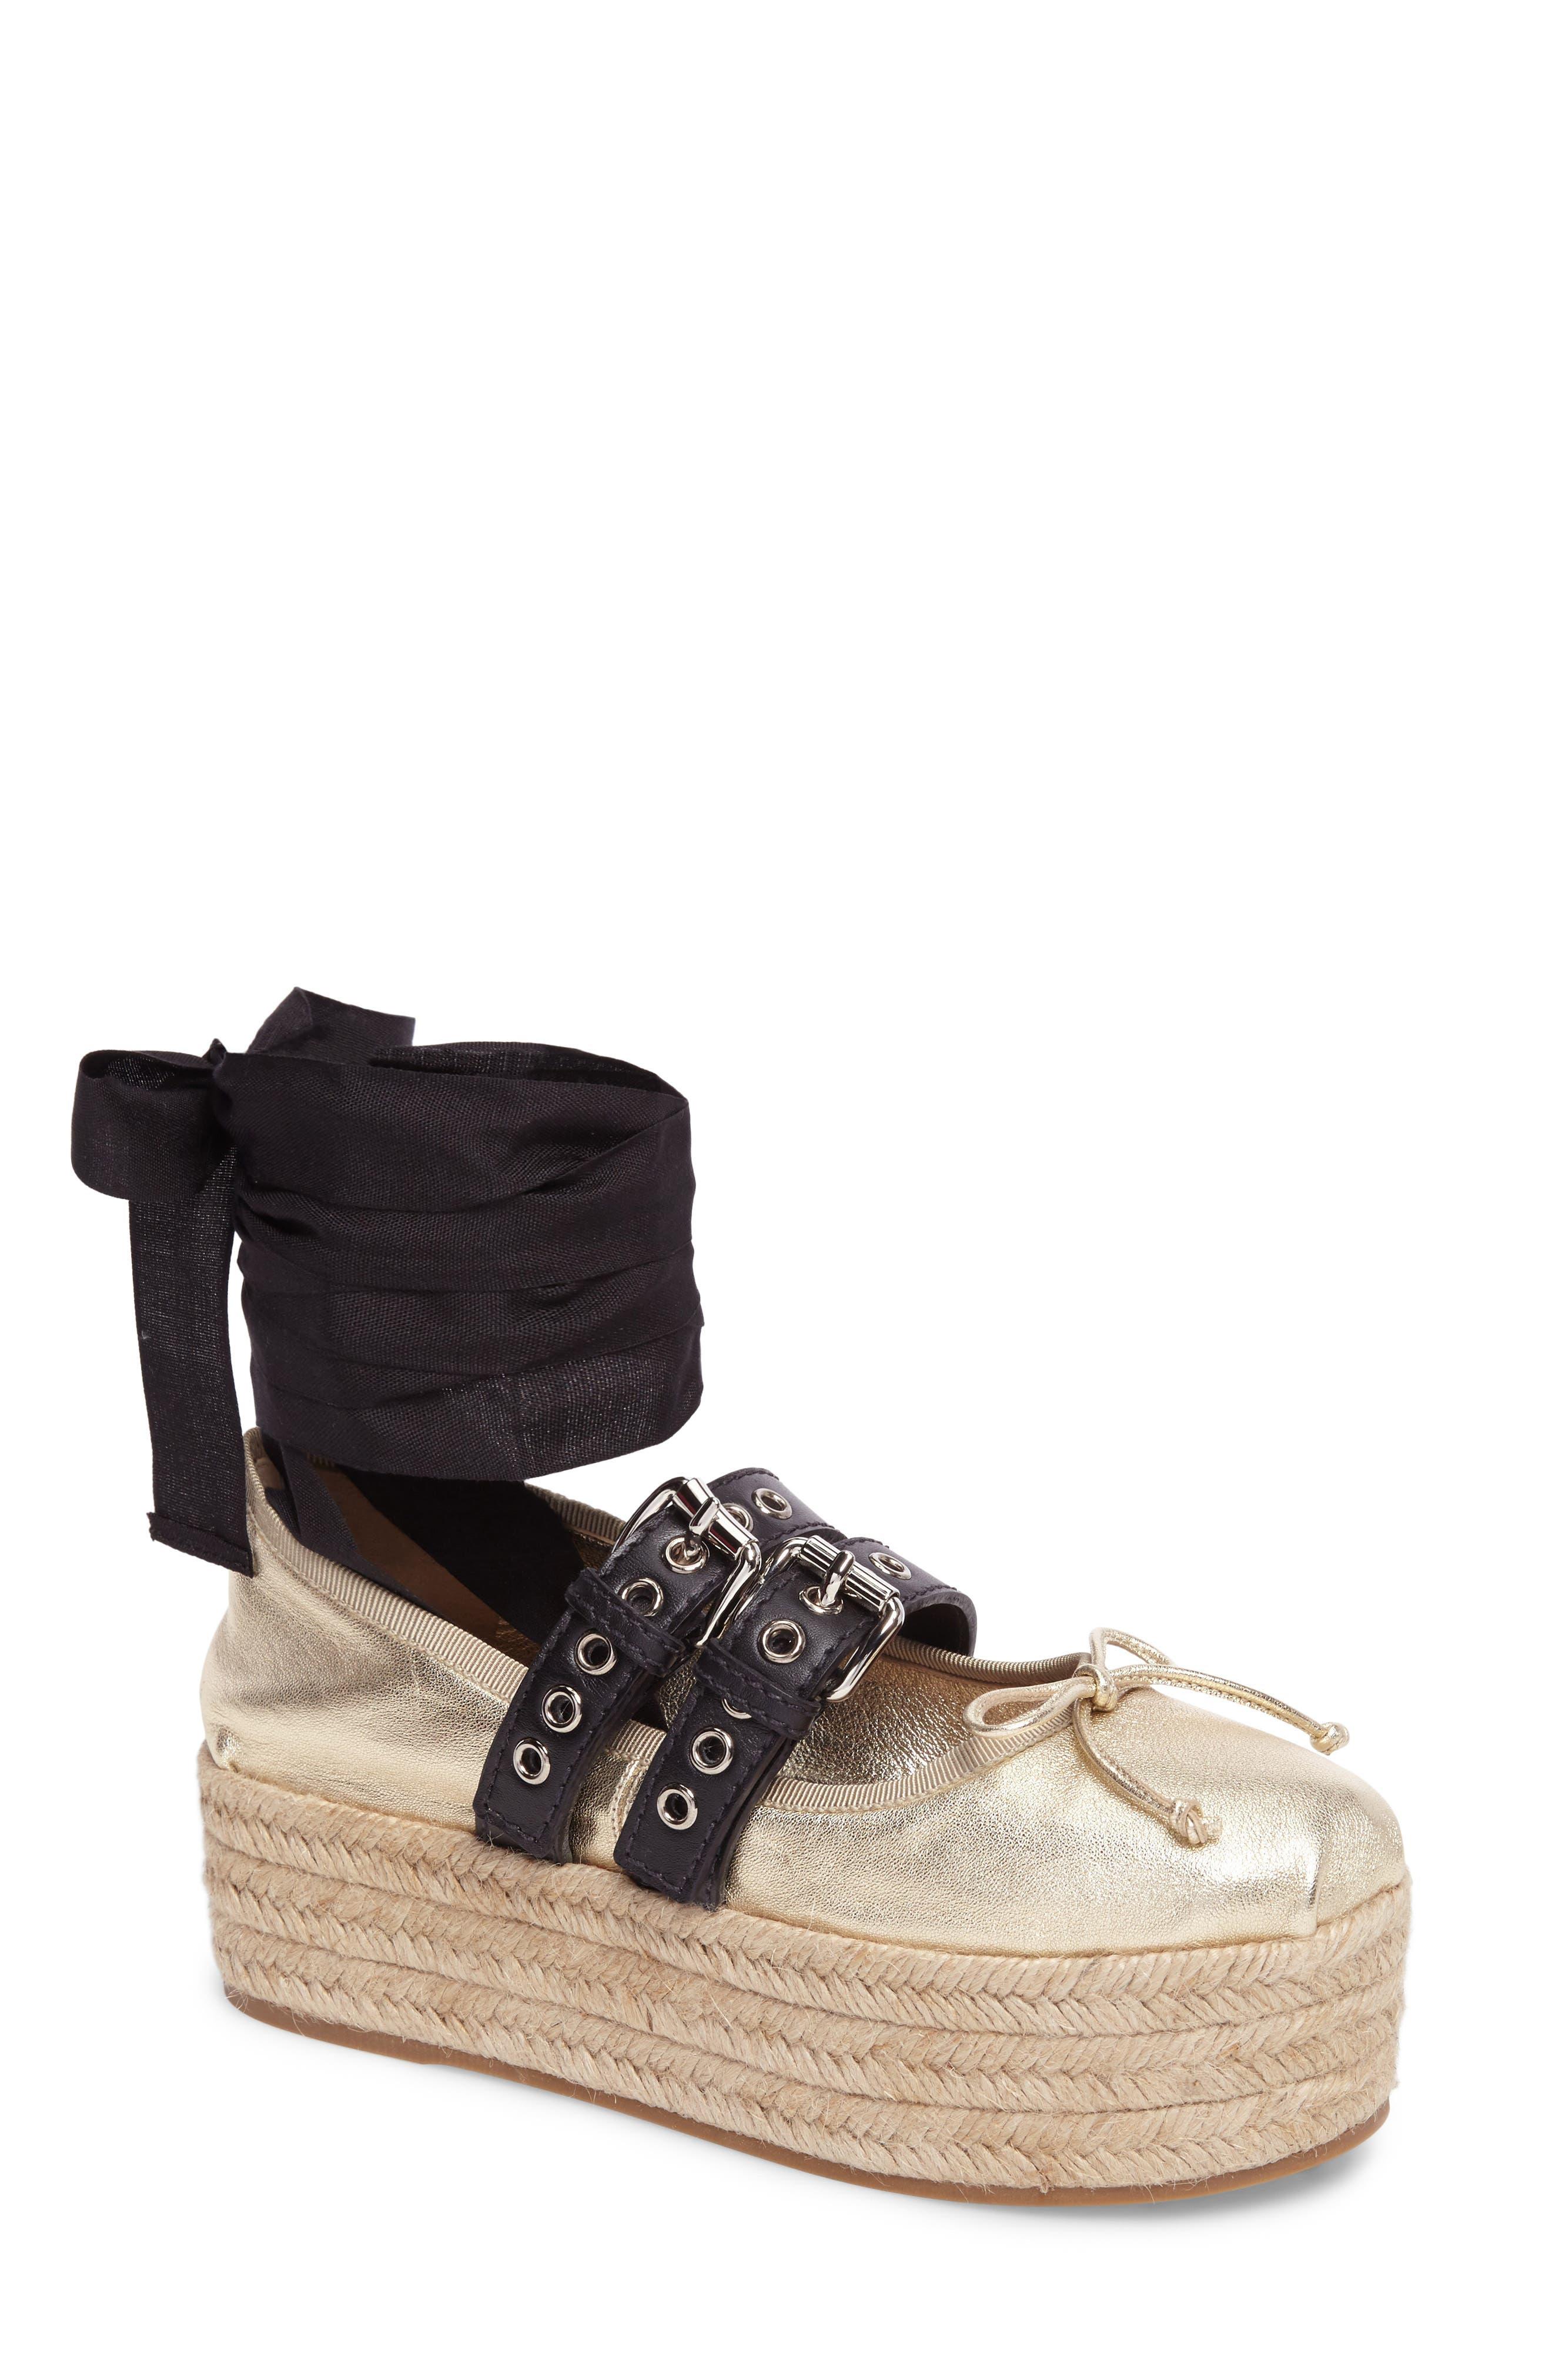 Alternate Image 1 Selected - Miu Miu Ankle Wrap Platform Espadrille (Women)